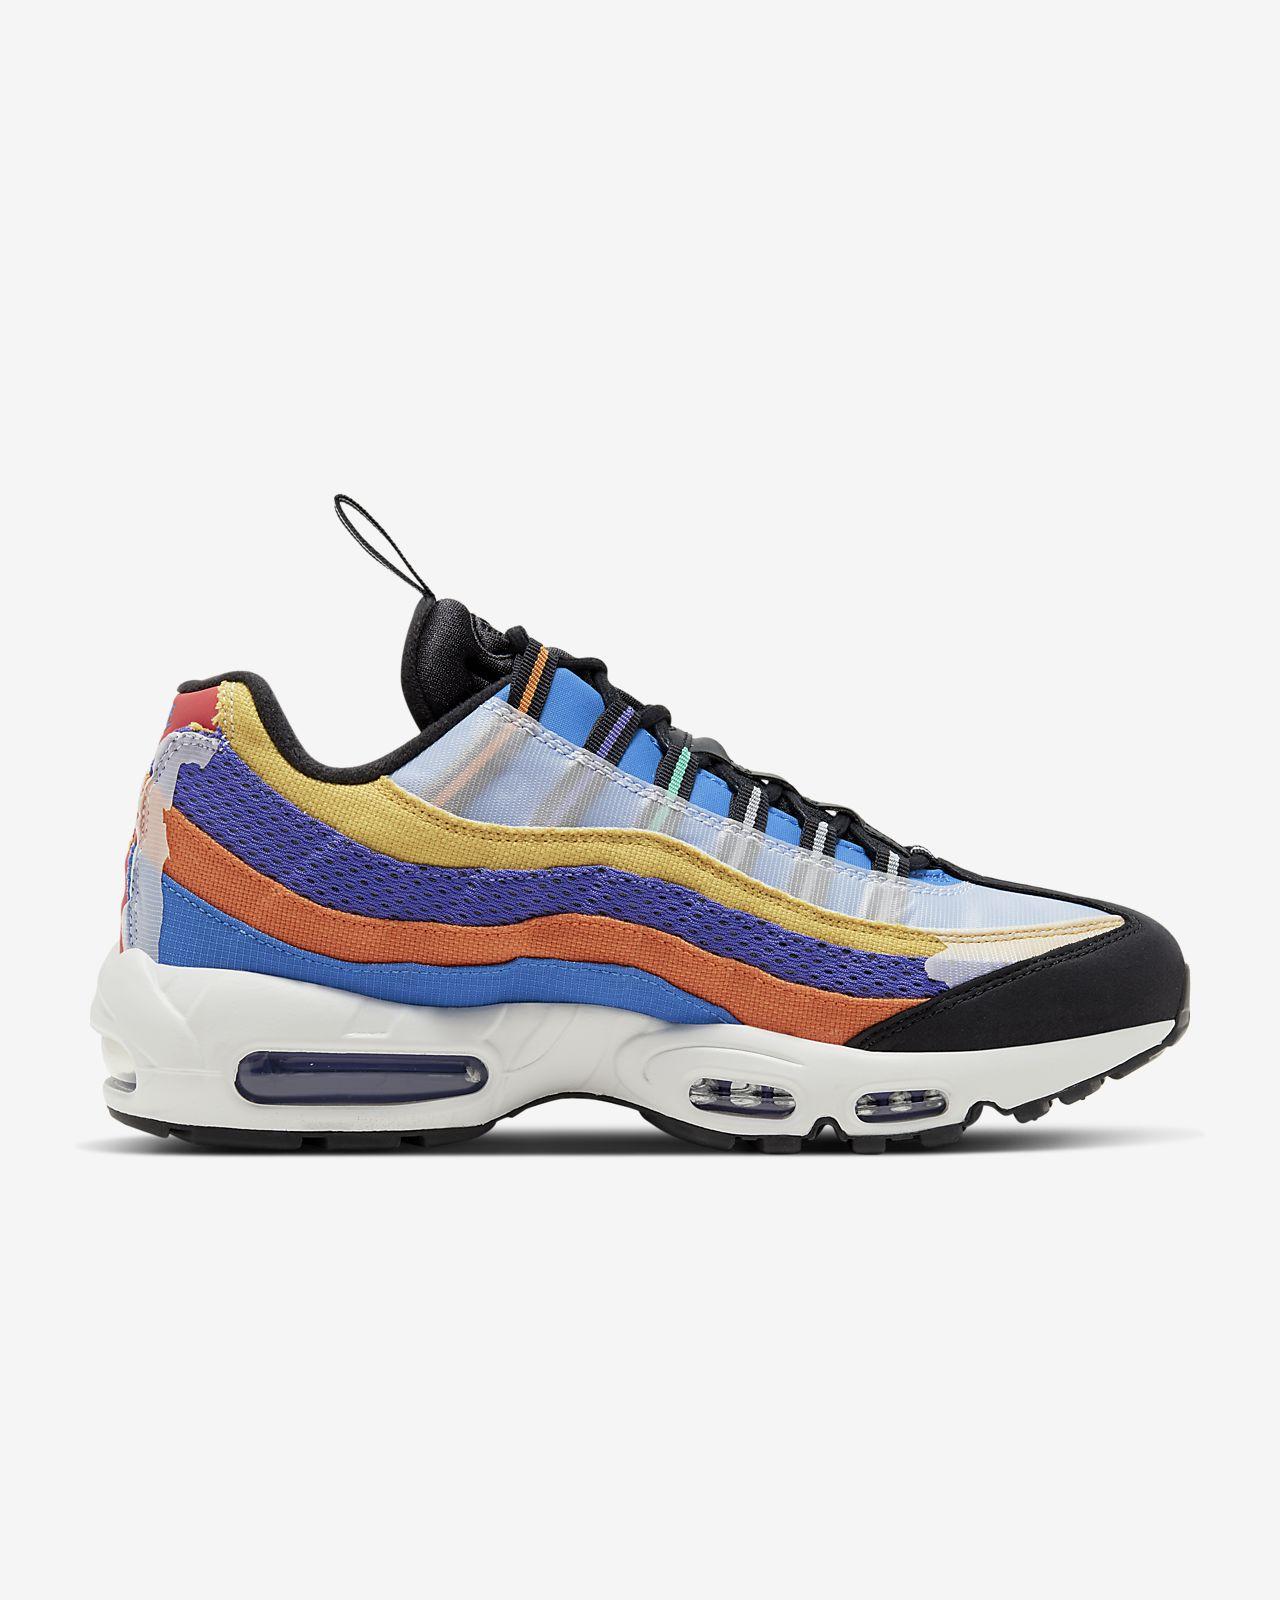 Nike Air Max 95 Black History Month Men's Shoe